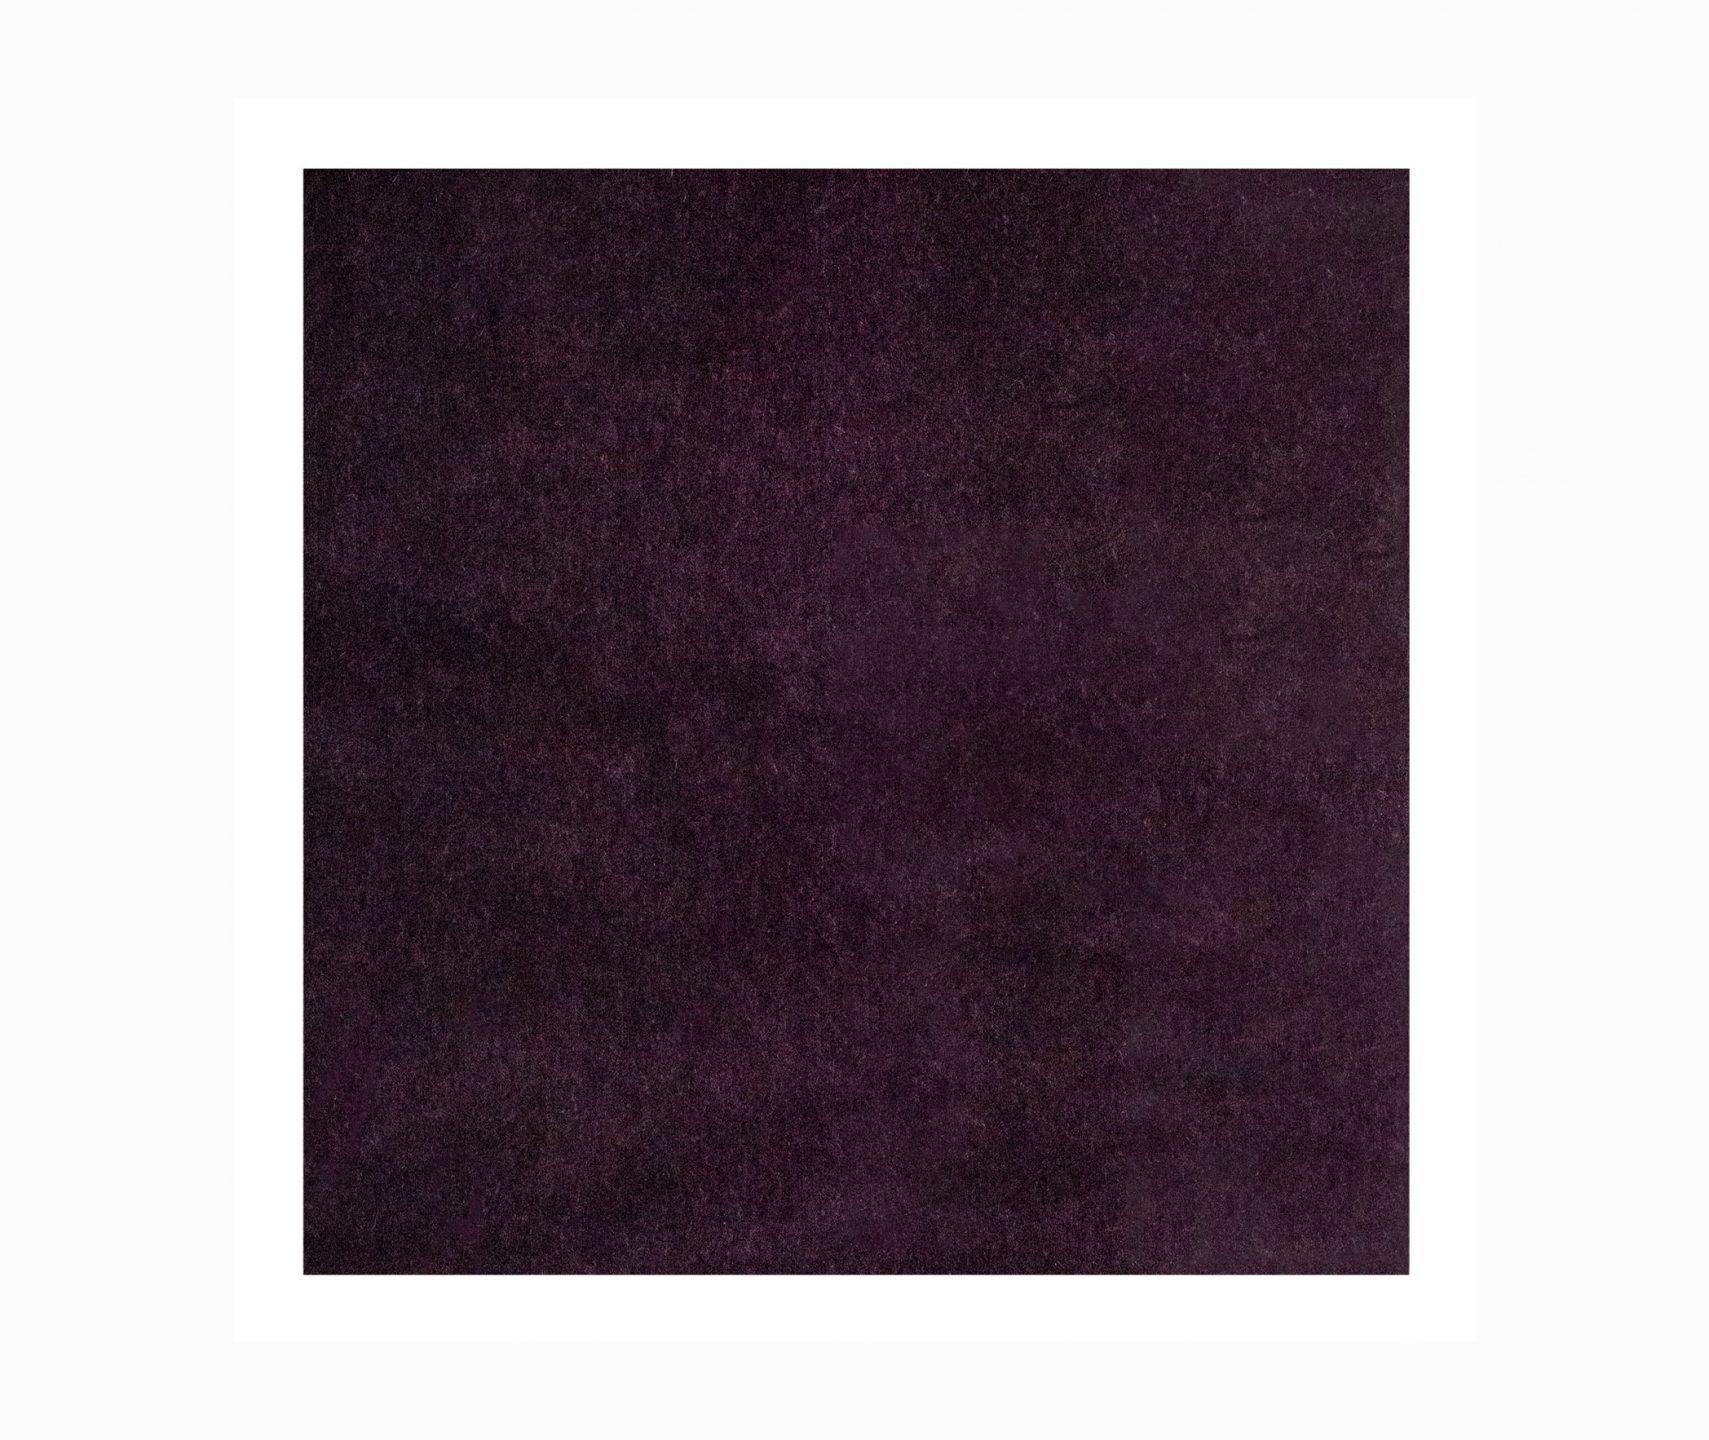 Rosemary-Hallgarten_Antoinette-Fabric_int_products